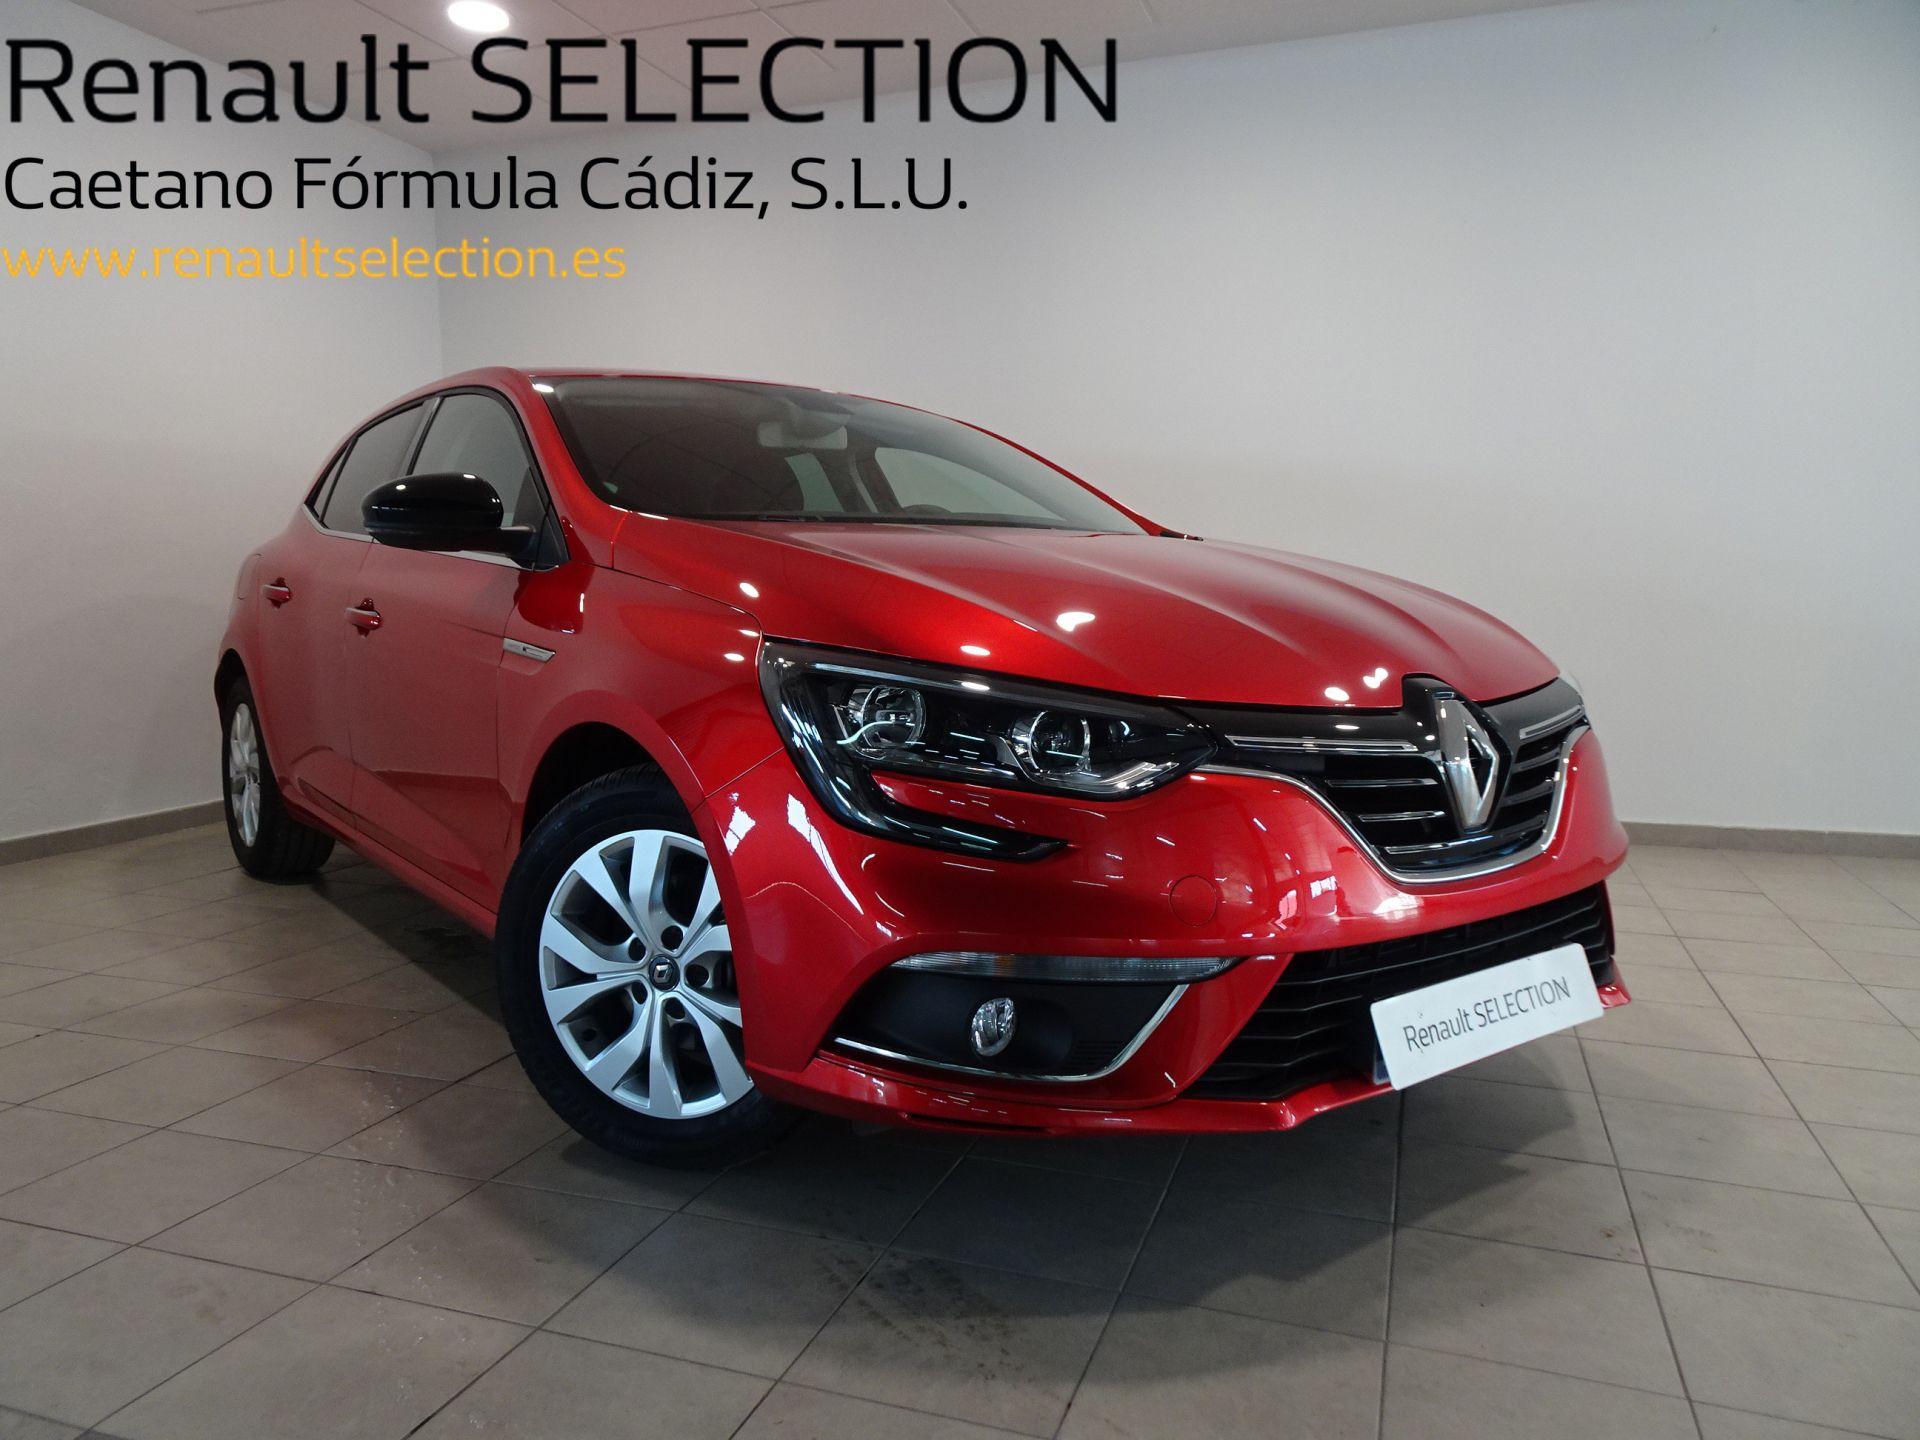 Renault Megane Limited TCe GPF 103 kW (140CV) EDC segunda mano Cádiz